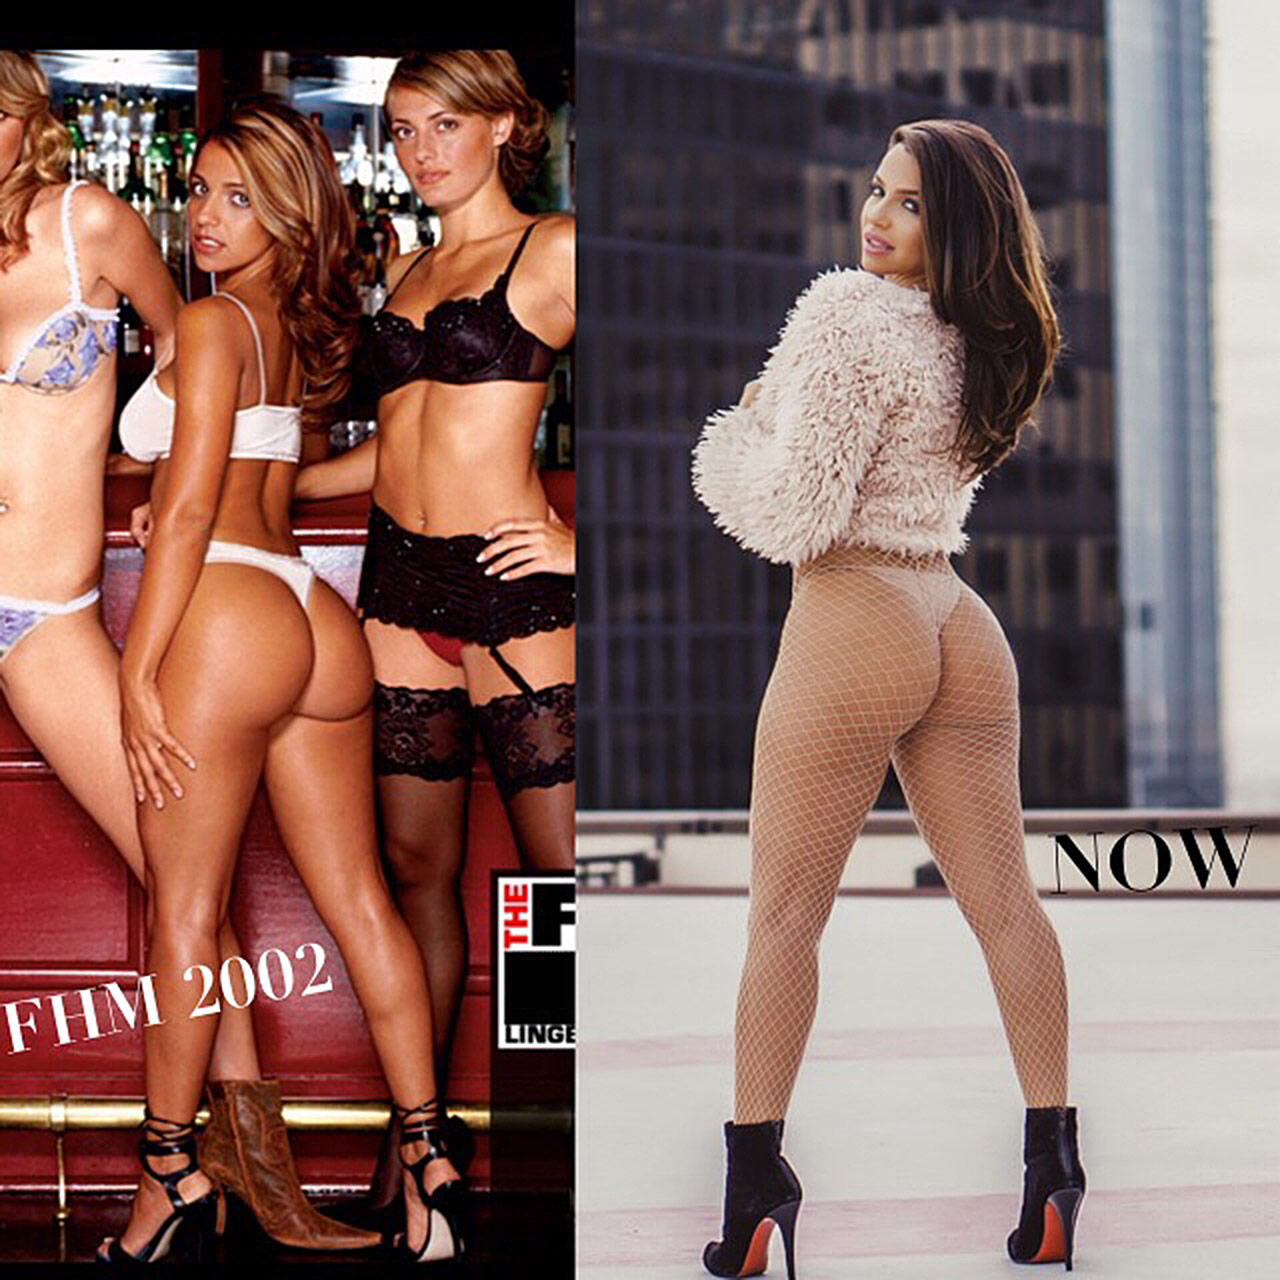 Sexy Vida Guerra Showed Her Big Butt In Hot Black Lingerie ...